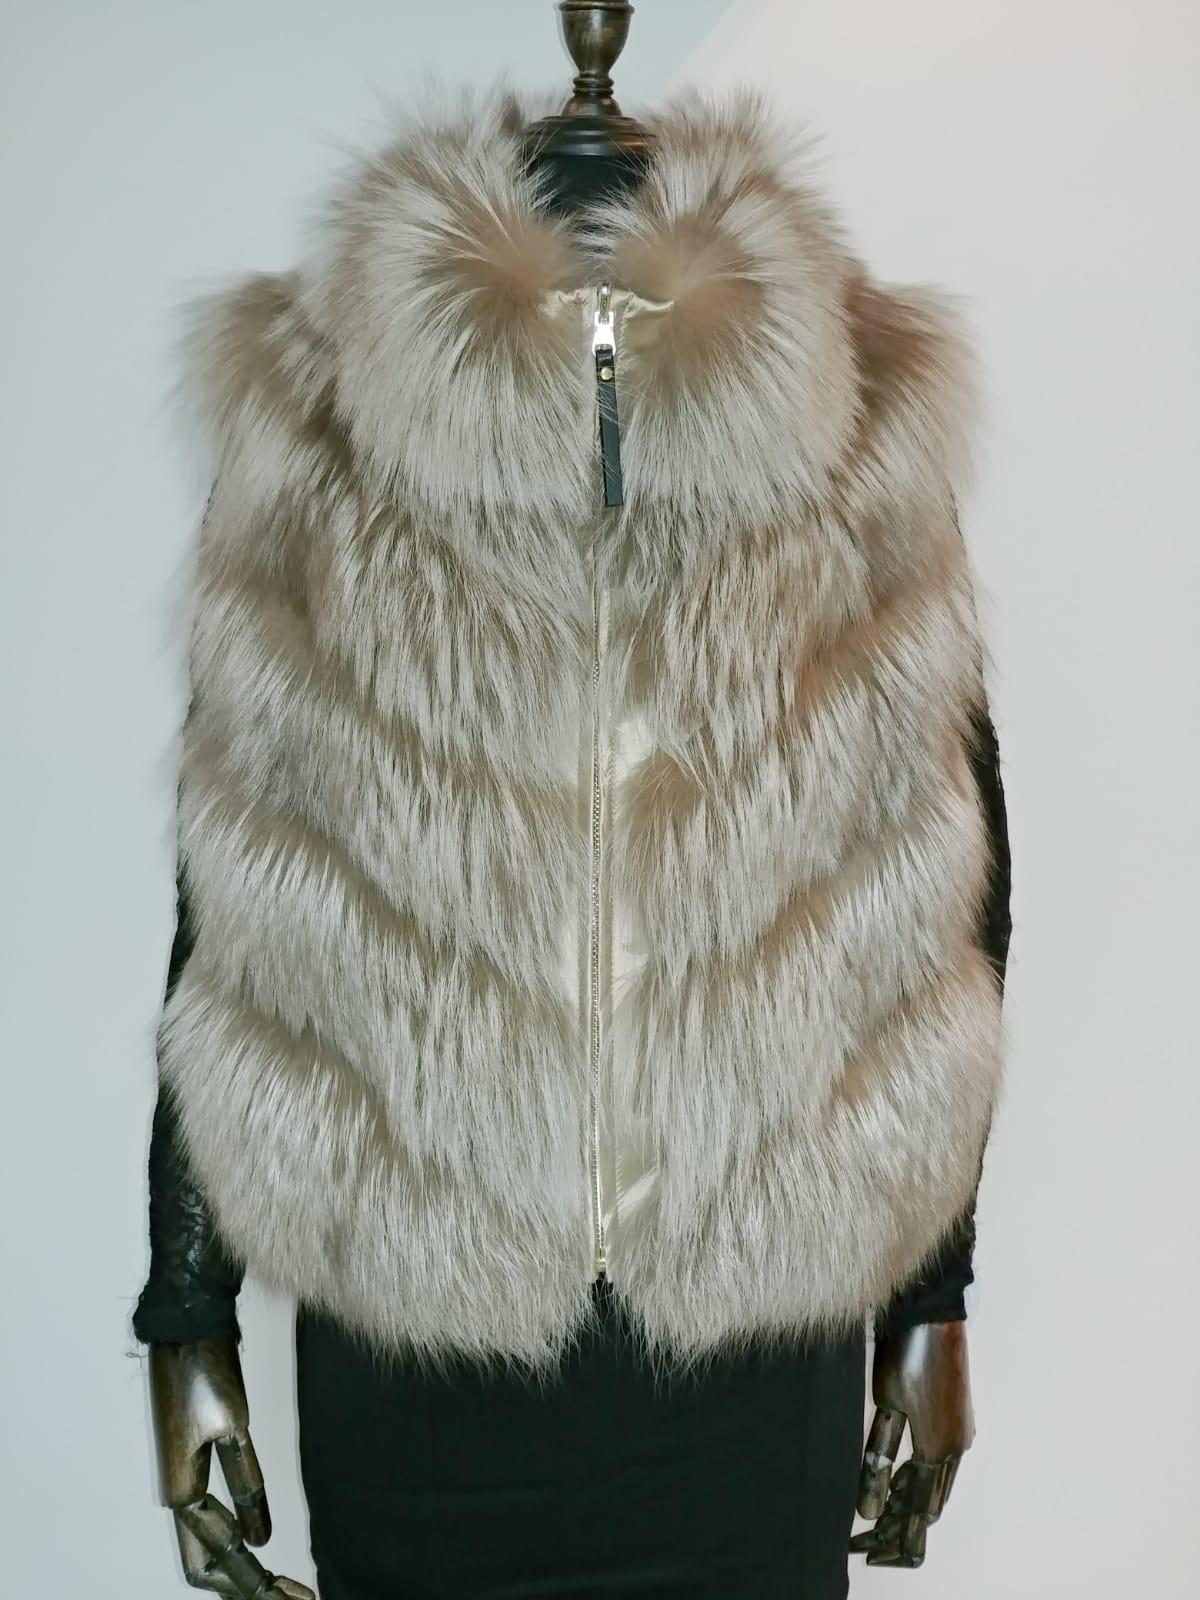 PV55559BU-AF - 51cm Arctic fox reversible down Vest (90% goose down) US$680, special price: US$480